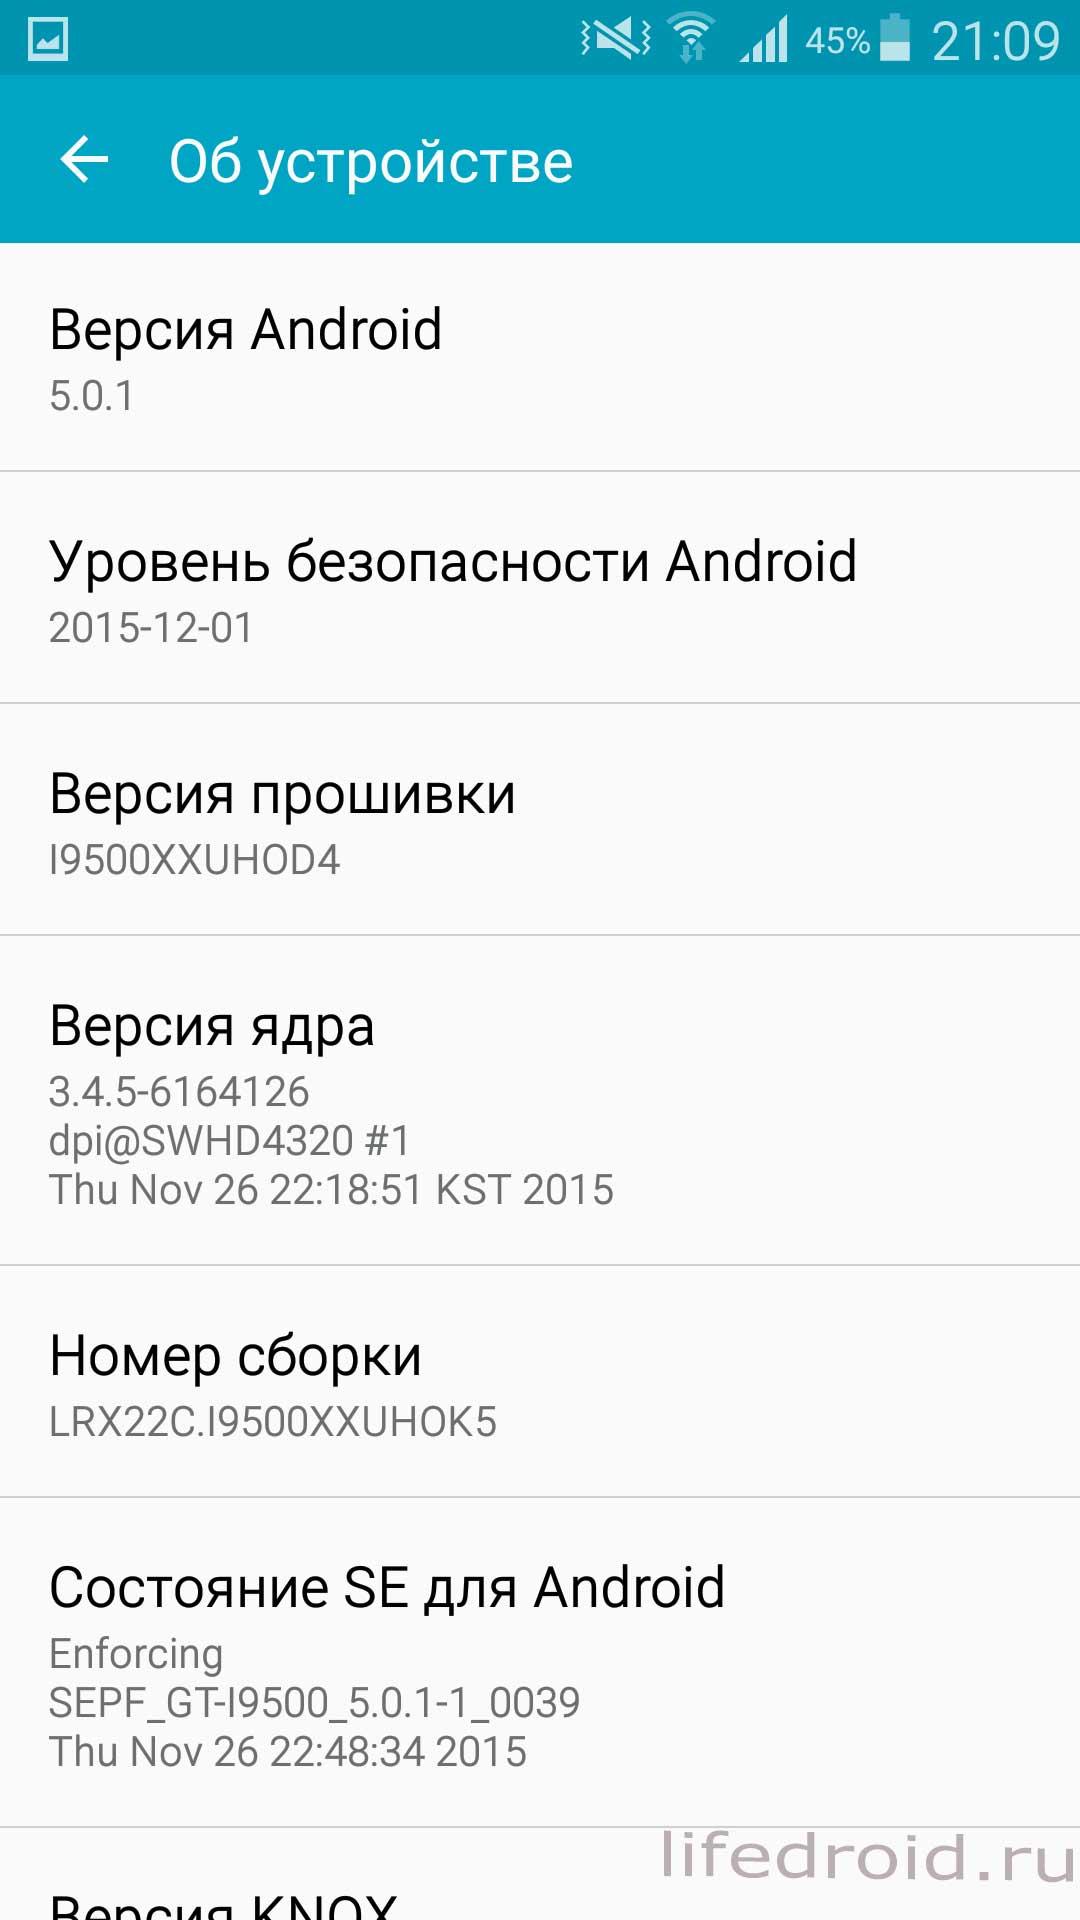 Версия Android